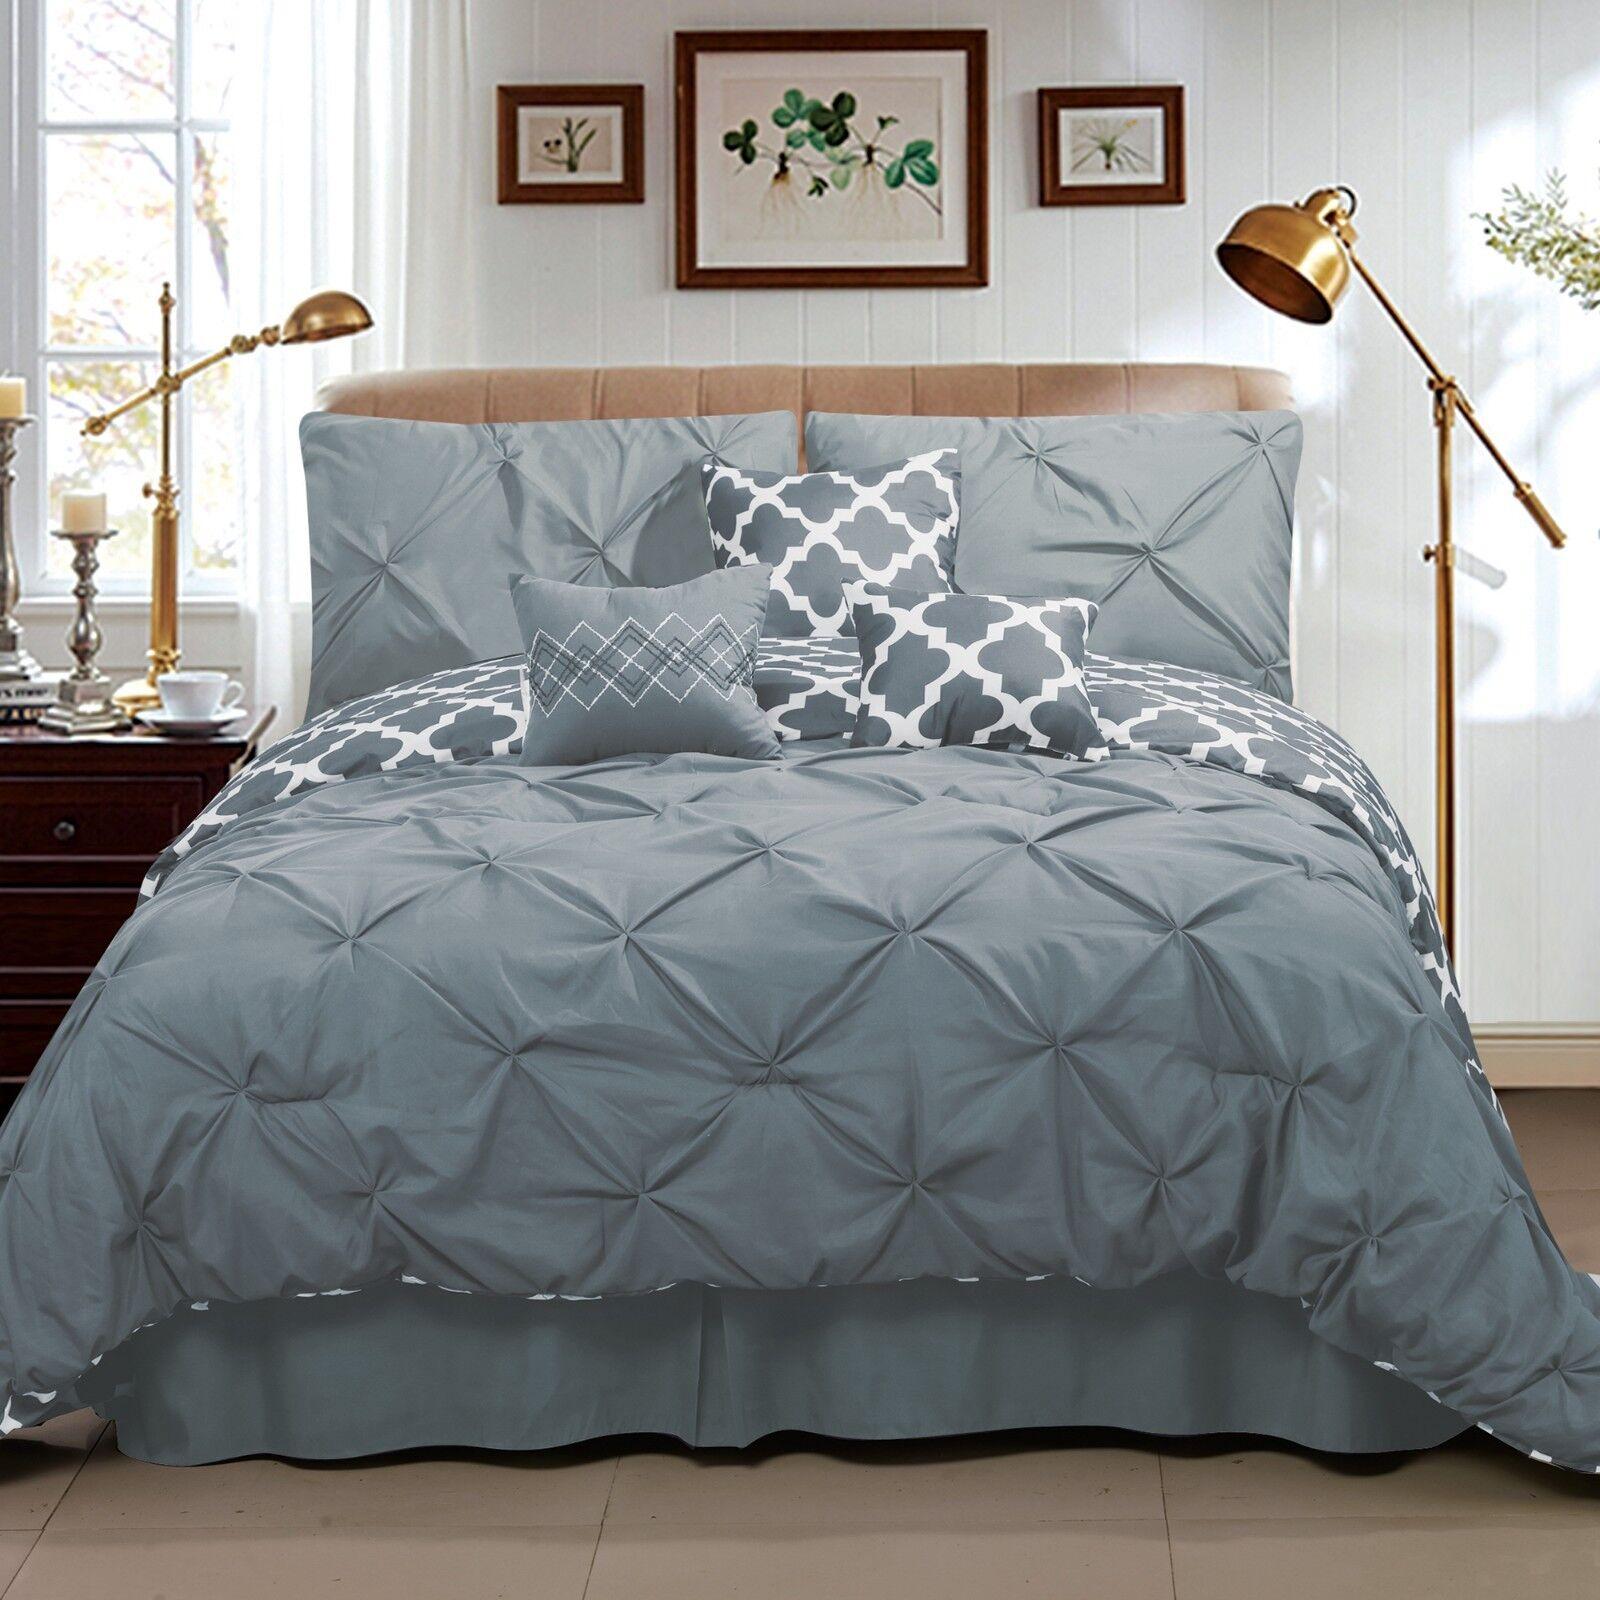 Deluxe grau Weiß Pleat Pinch Fretwork Reversible comforter 7 pcs Set